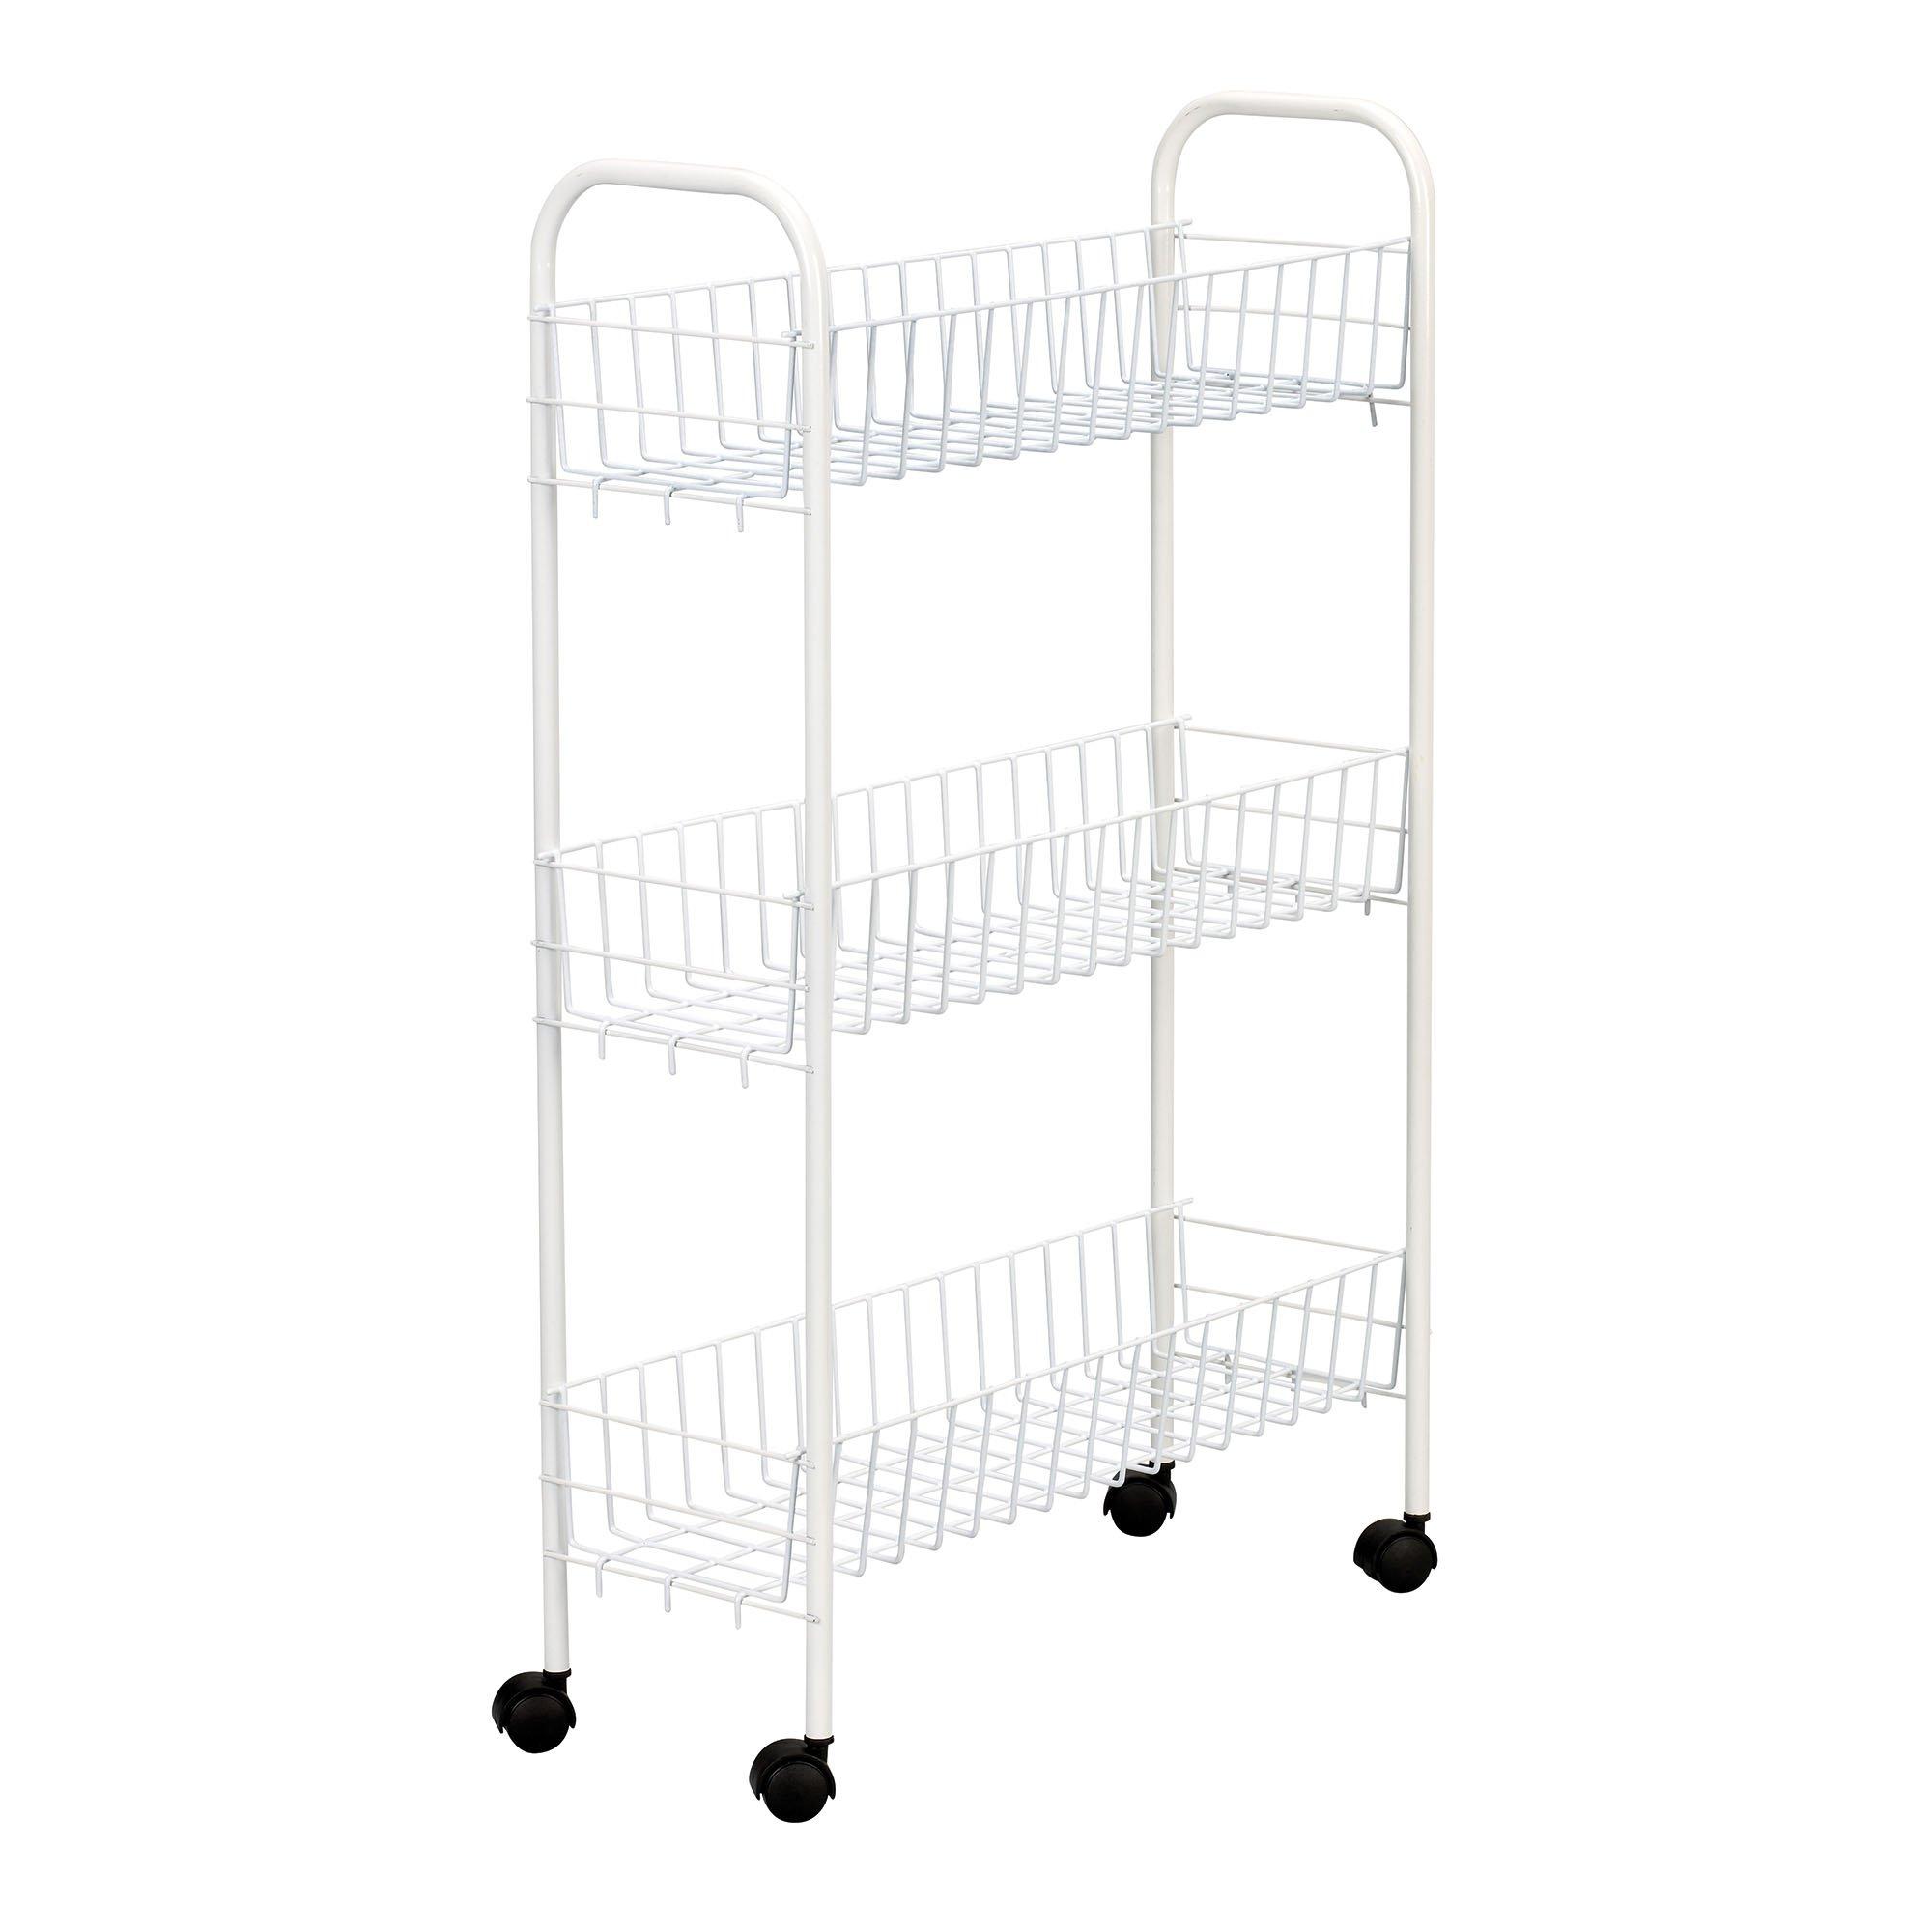 Household Essentials 05121 Slim Line 3-Tier Metal Storage Cart | Laundry Room Rolling Organizer | White by Household Essentials